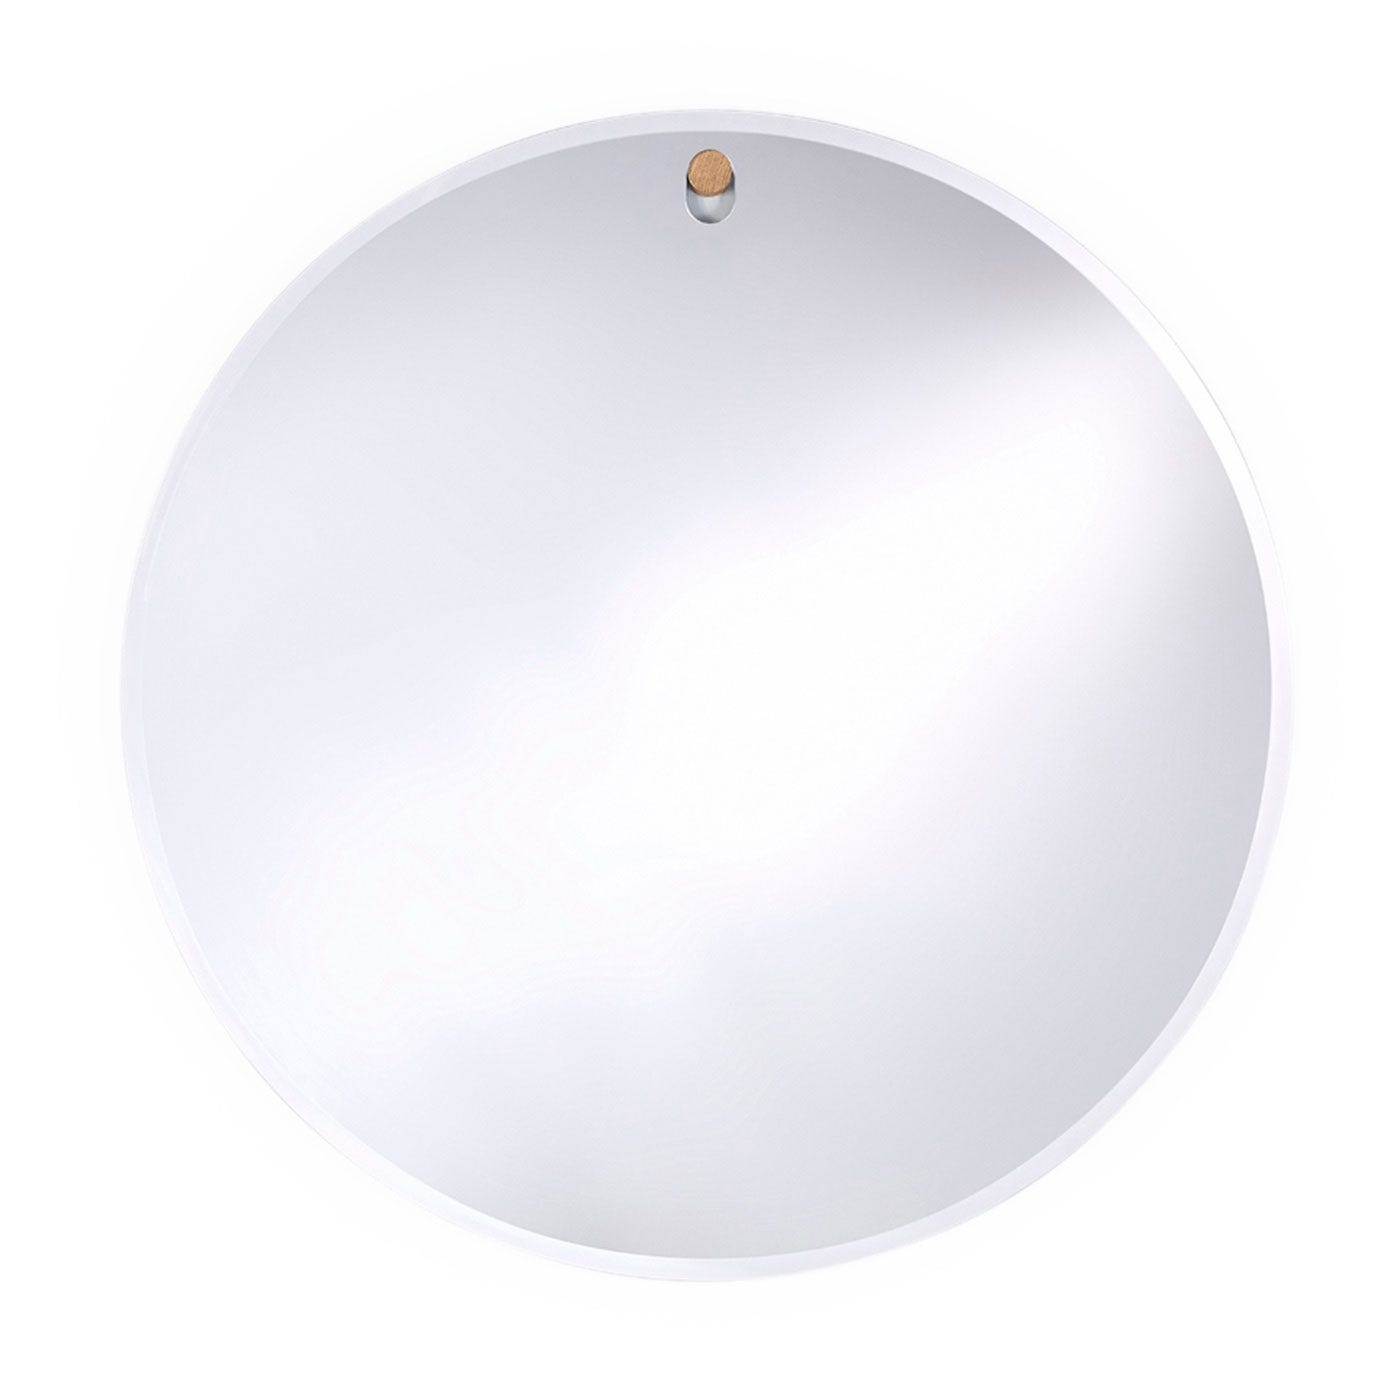 Globo Round Mirror Large